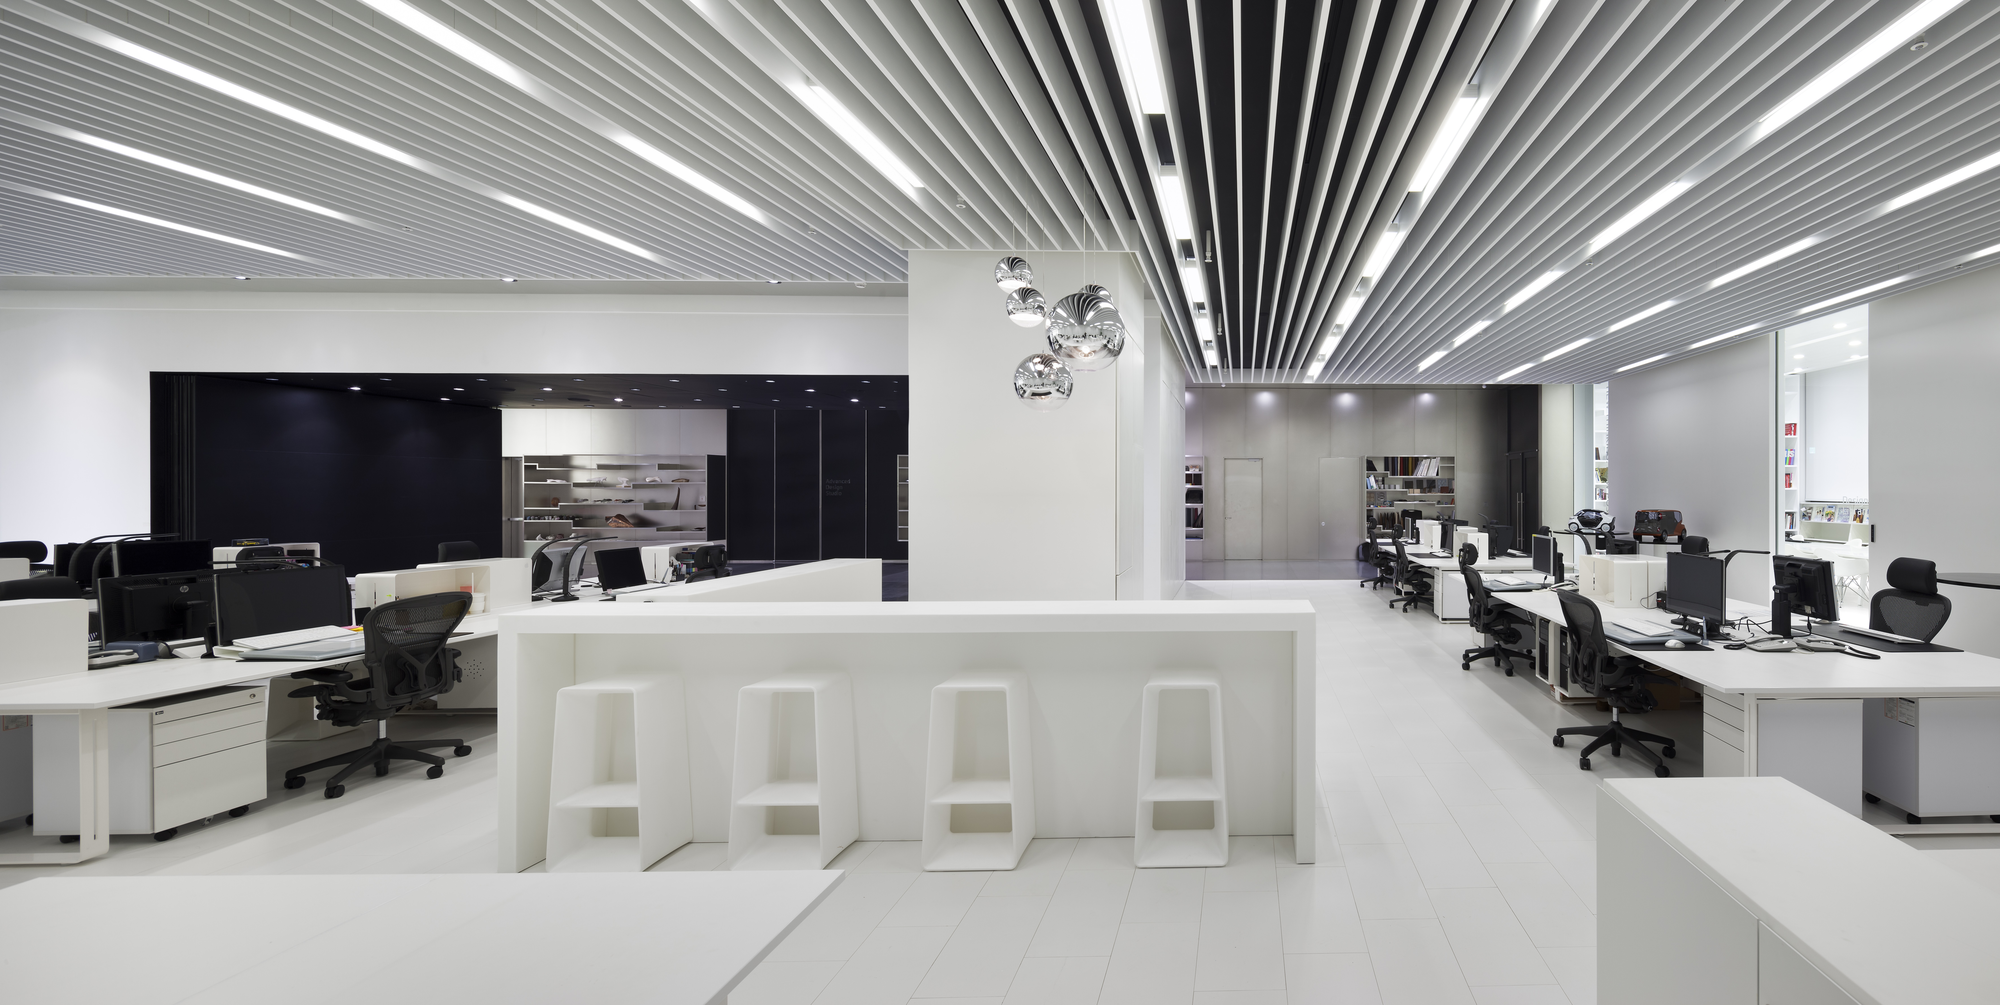 Gallery of hyundai advances design studio delugan meissl for Studio interior design london